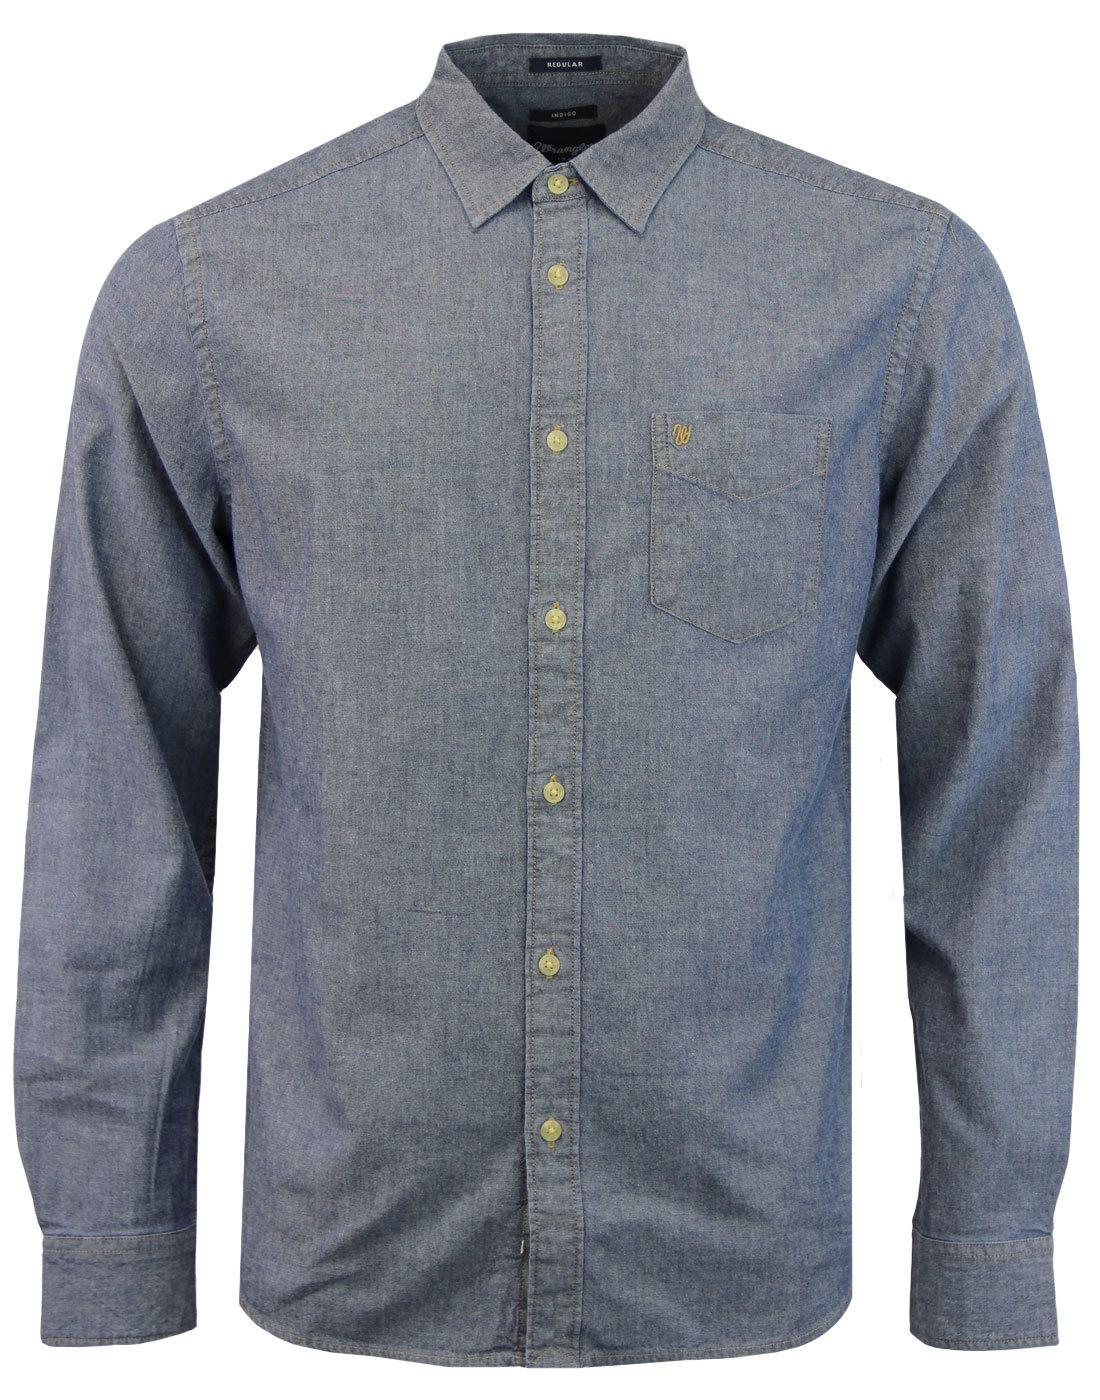 WRANGLER Retro Button Down 1 Pocket Shirt Indigo